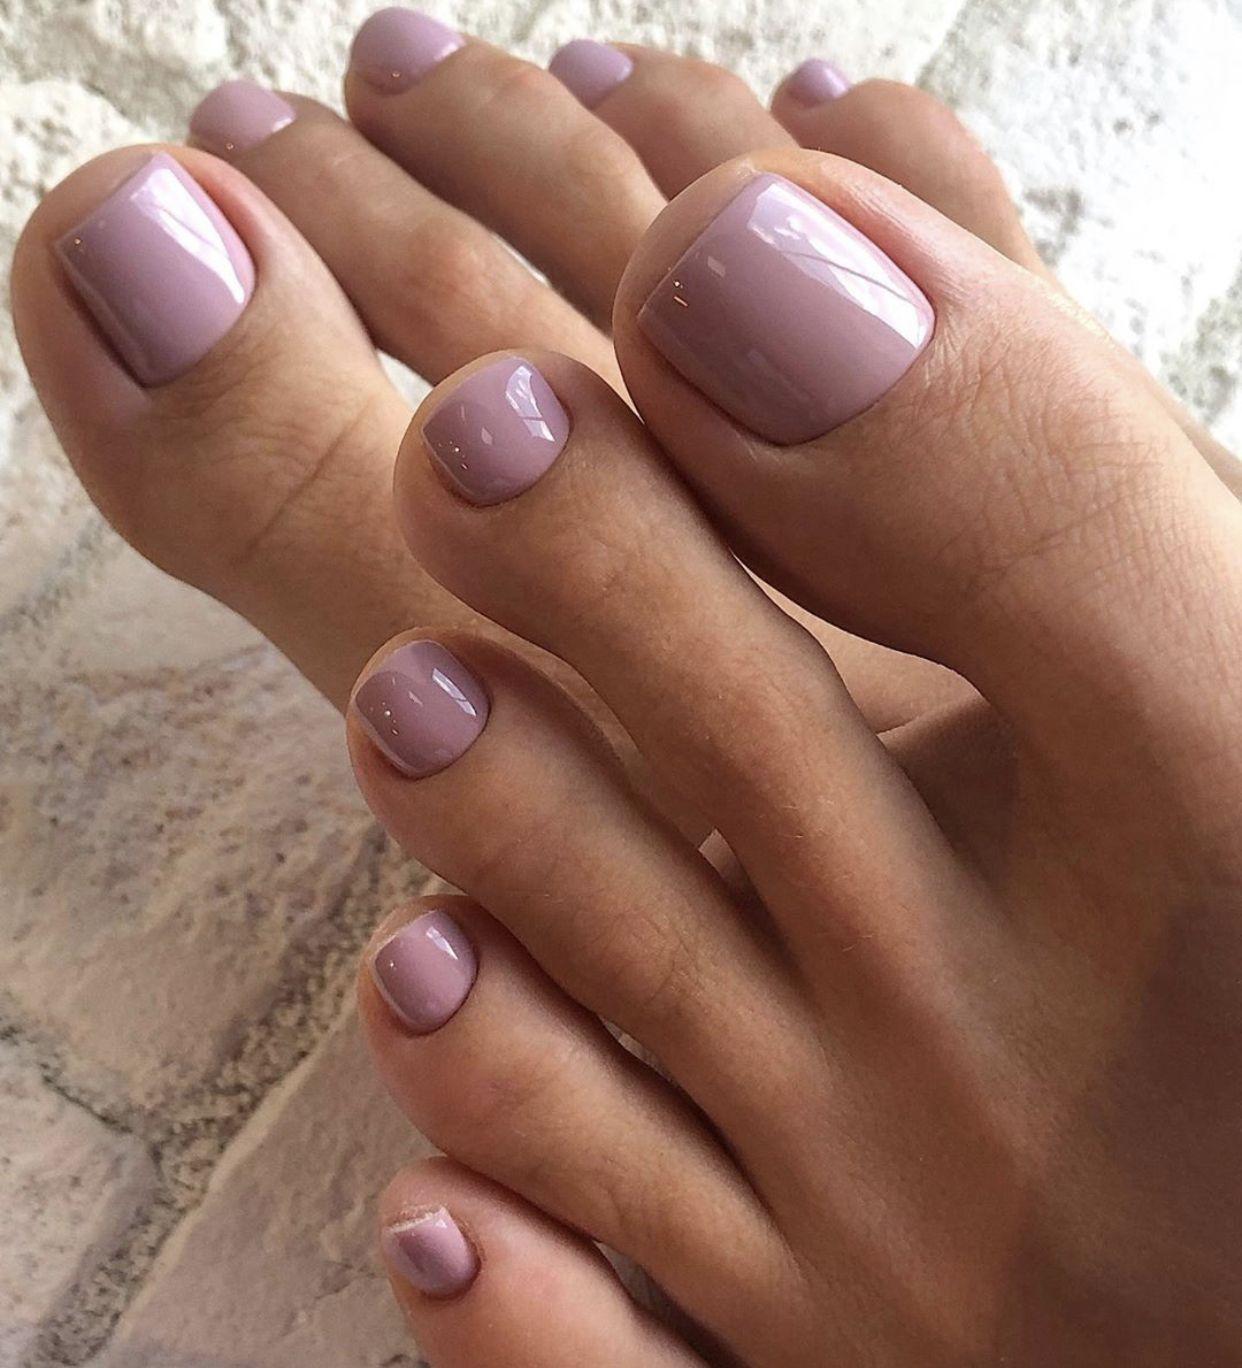 Pin By Judita Nagyvathy On Pedicure Pretty Toe Nails Gel Toe Nails Acrylic Toe Nails